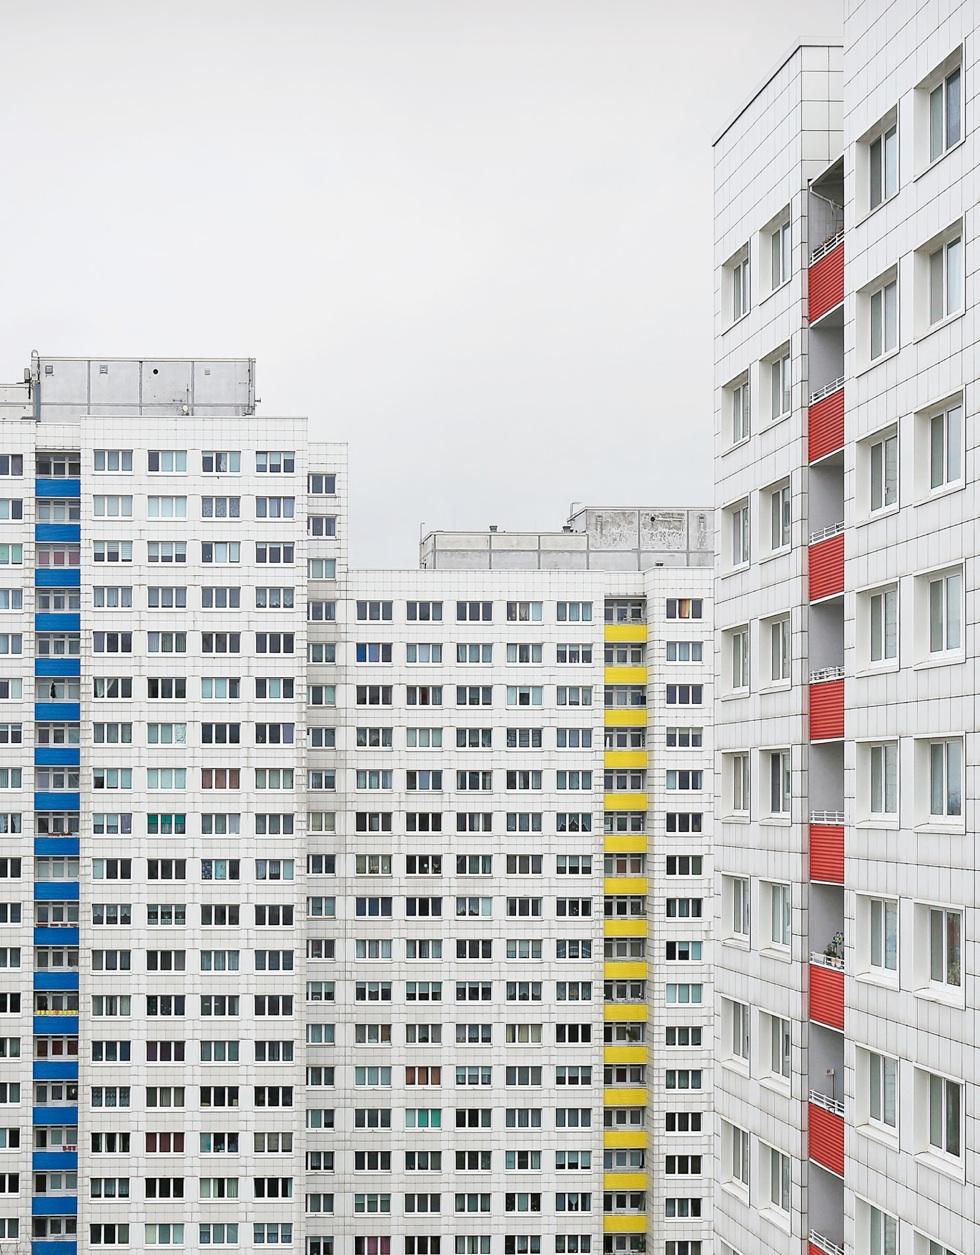 zupagrafika hiddencities berlin 5